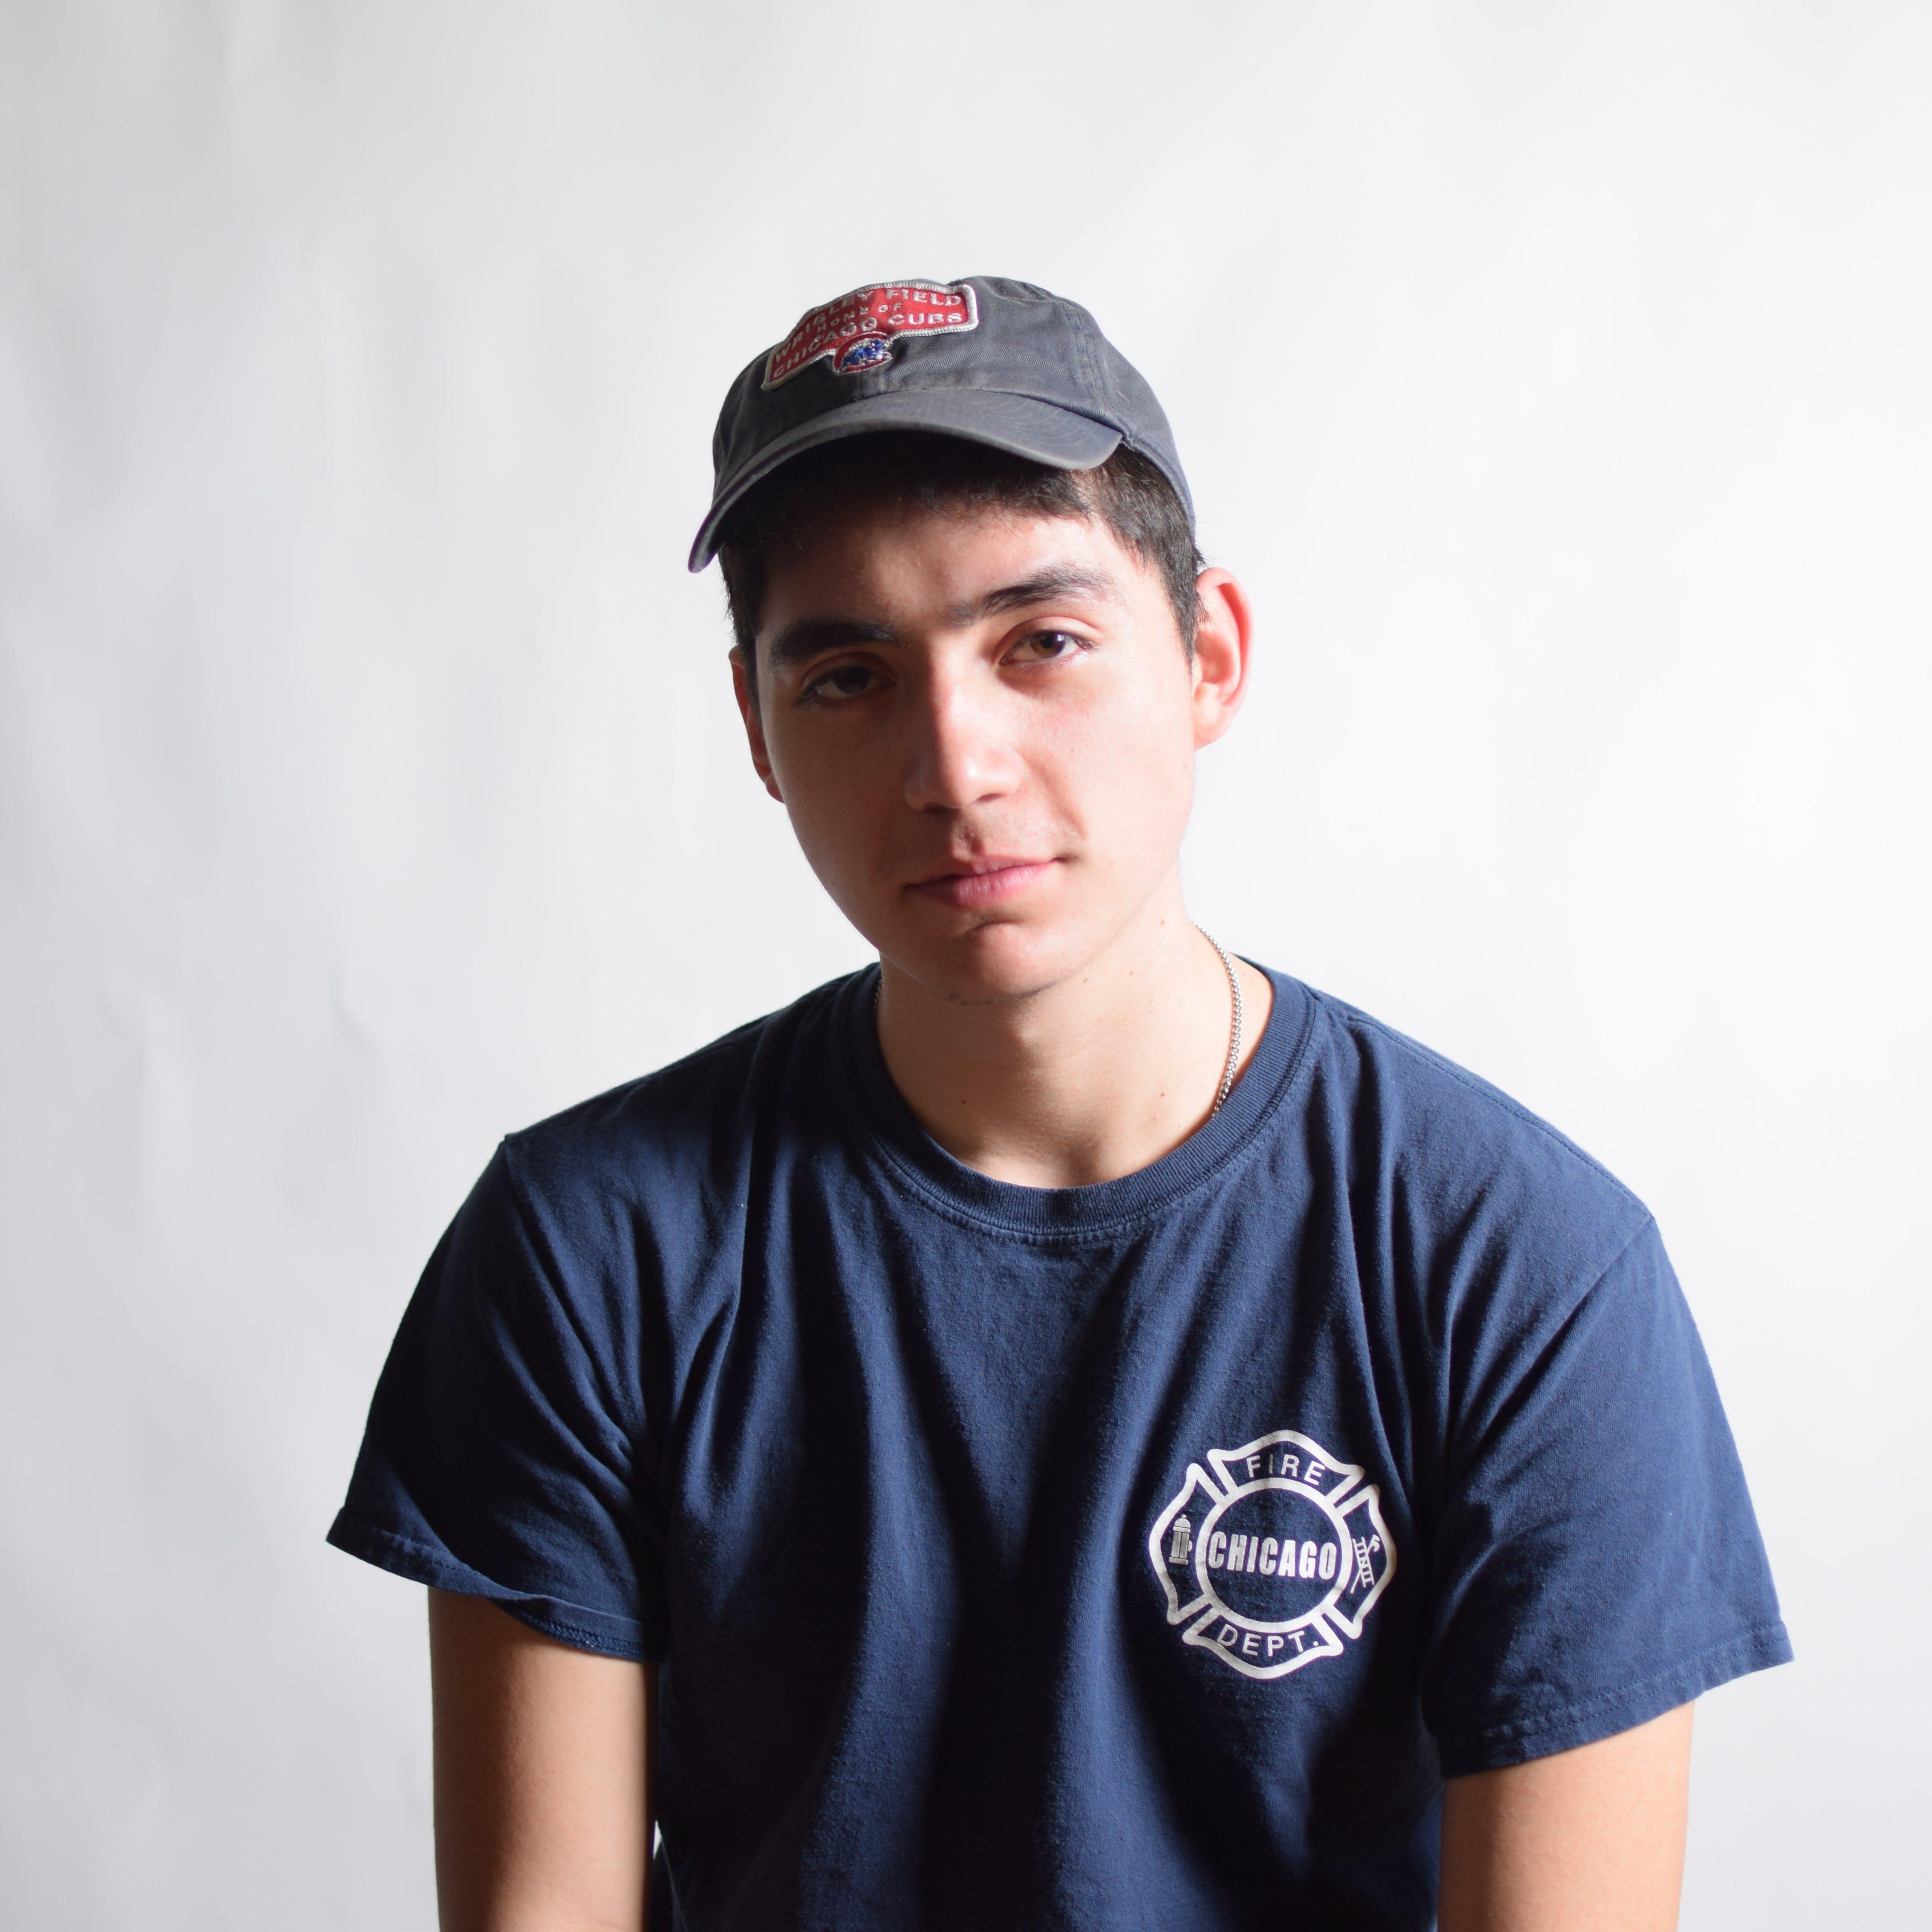 Charlie Medina